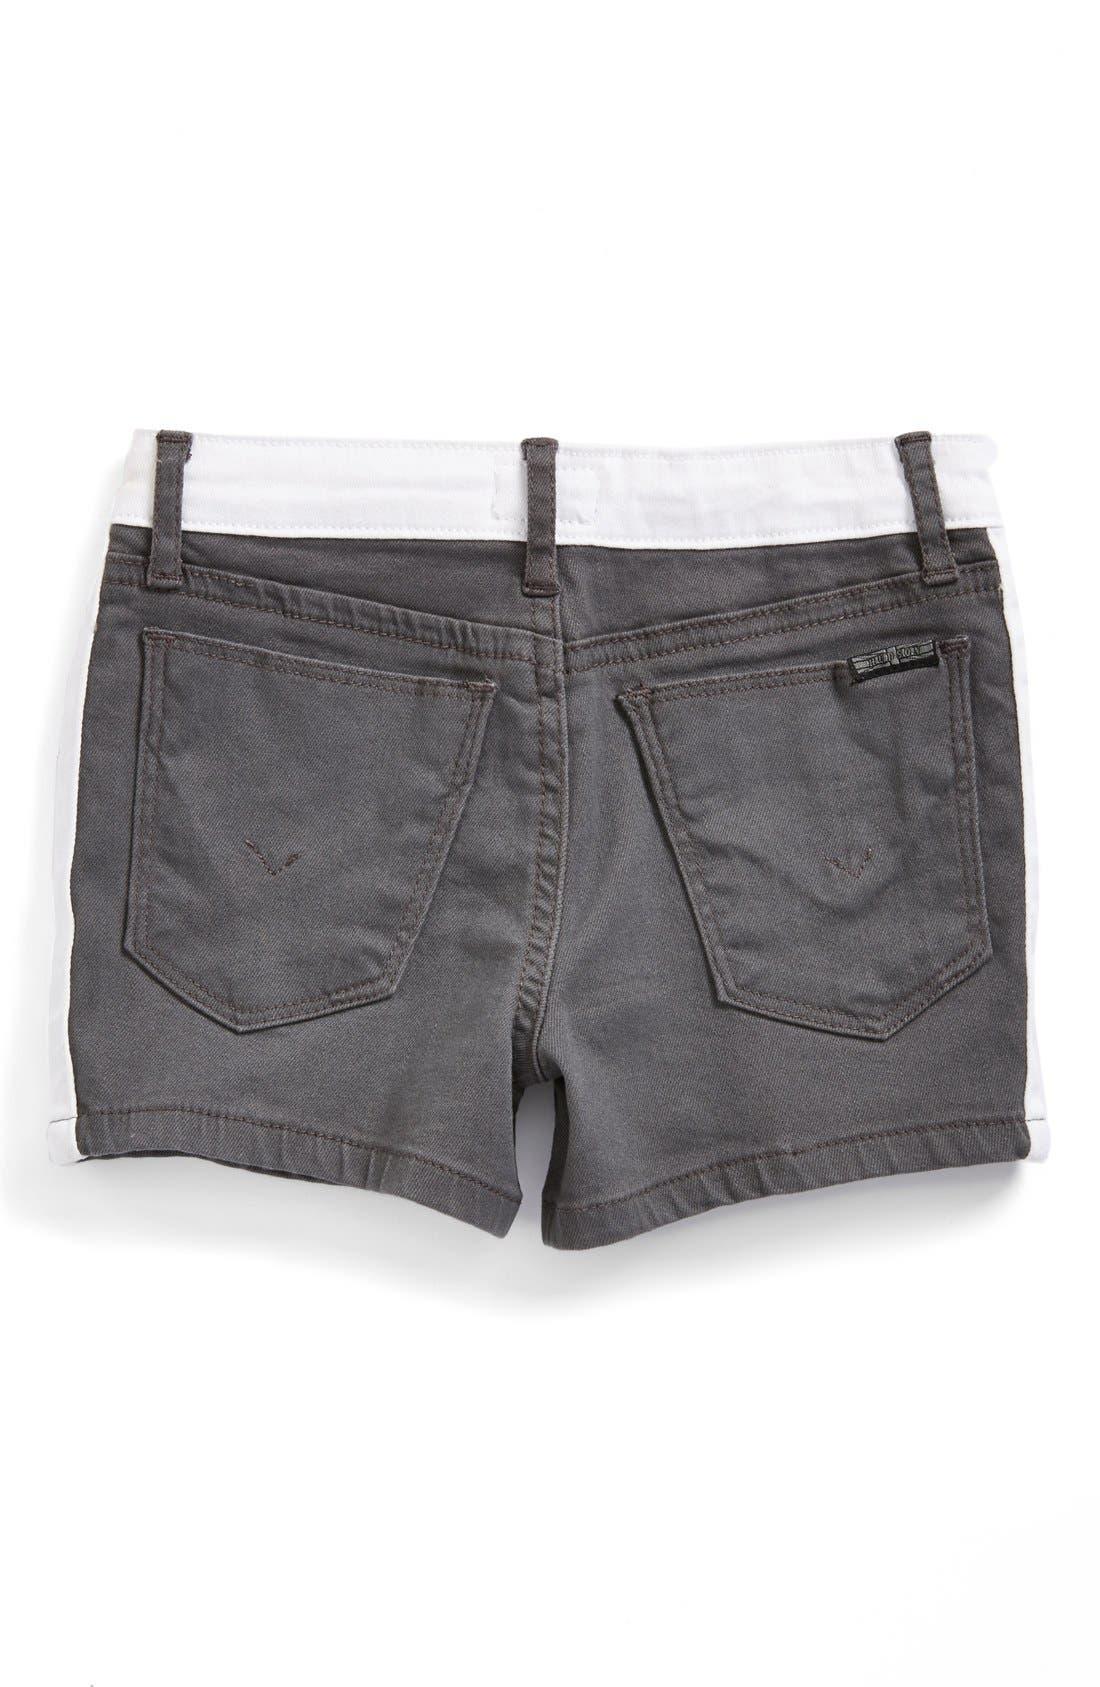 Alternate Image 1 Selected - Hudson Kids 'Leeloo' Shorts (Little Girls & Big Girls)(Online Only)